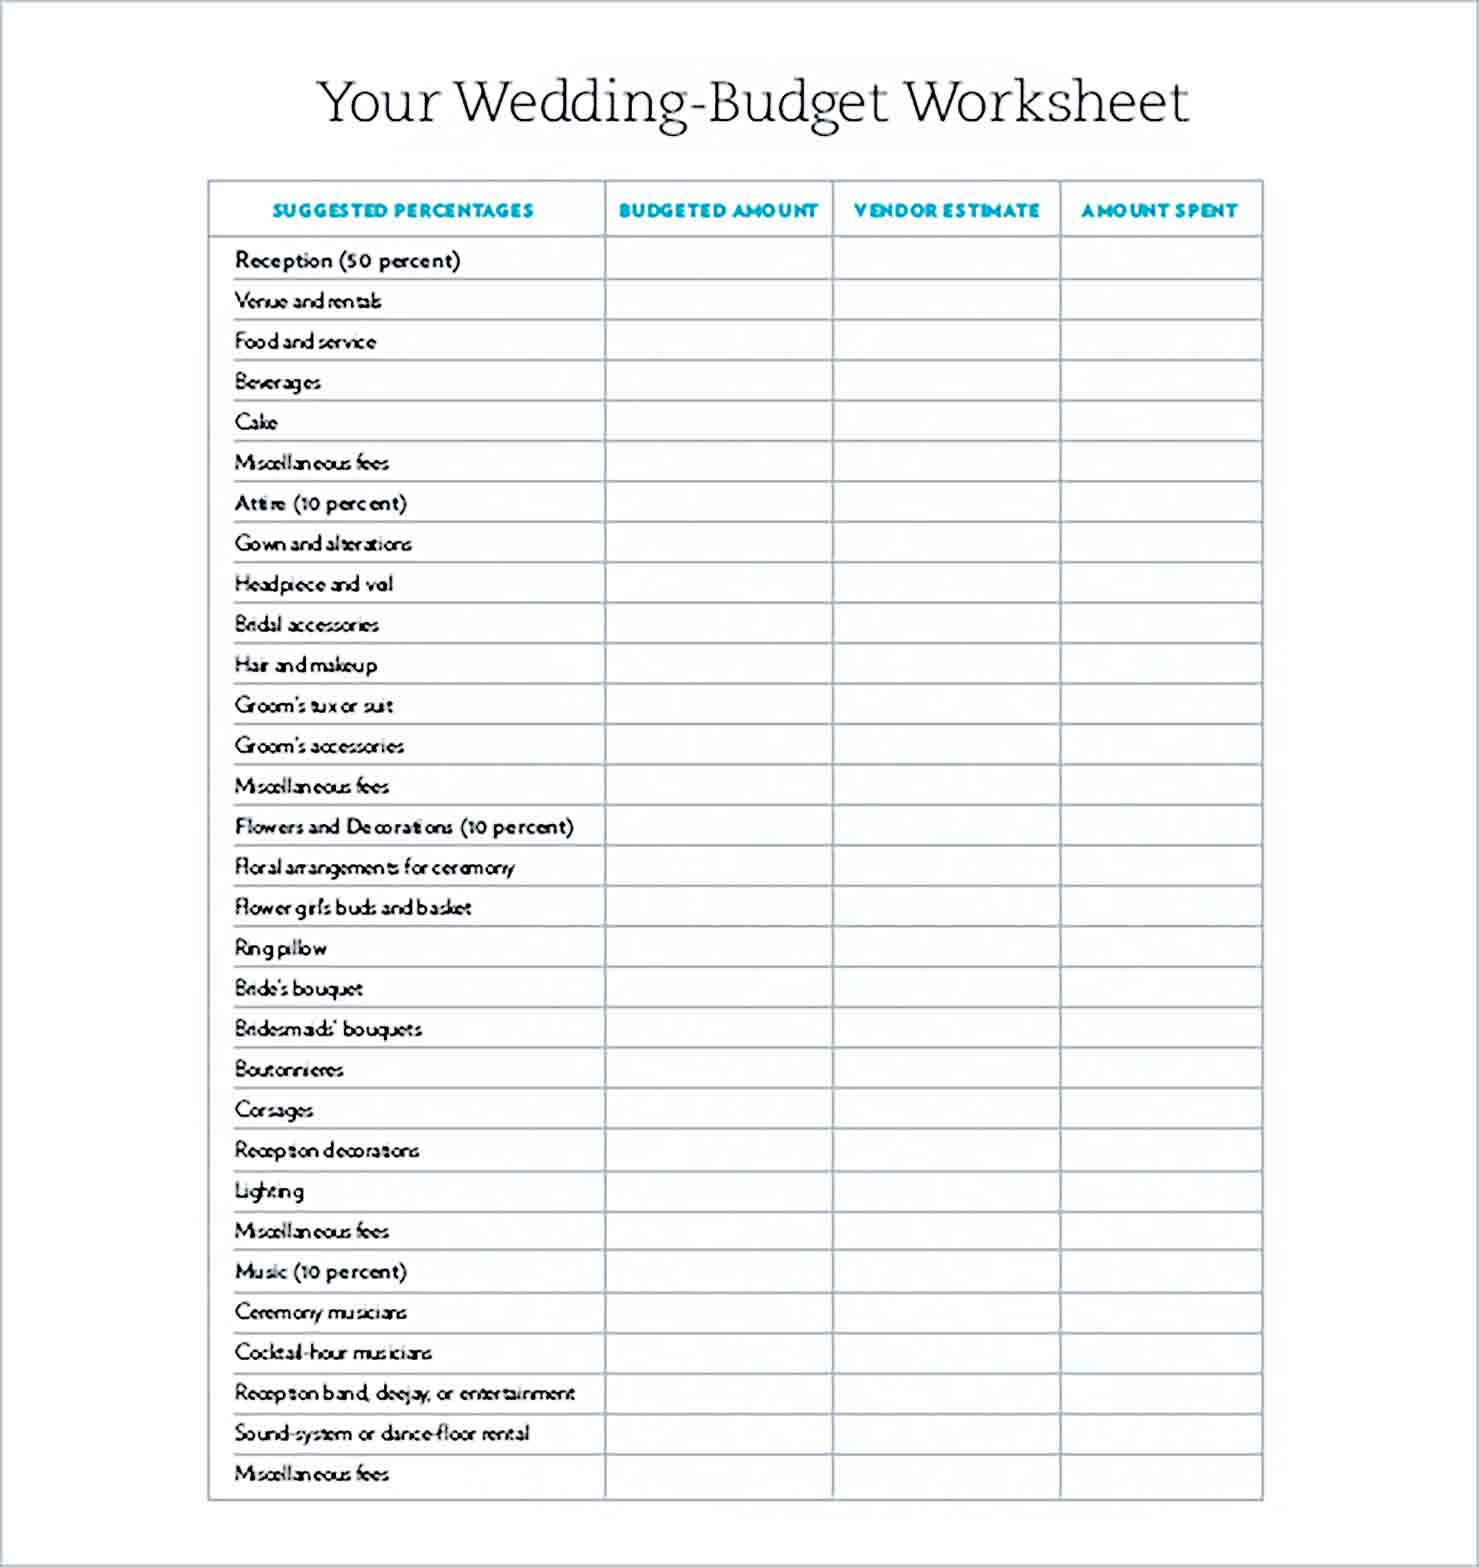 Sample Wedding Budget XL Sheet